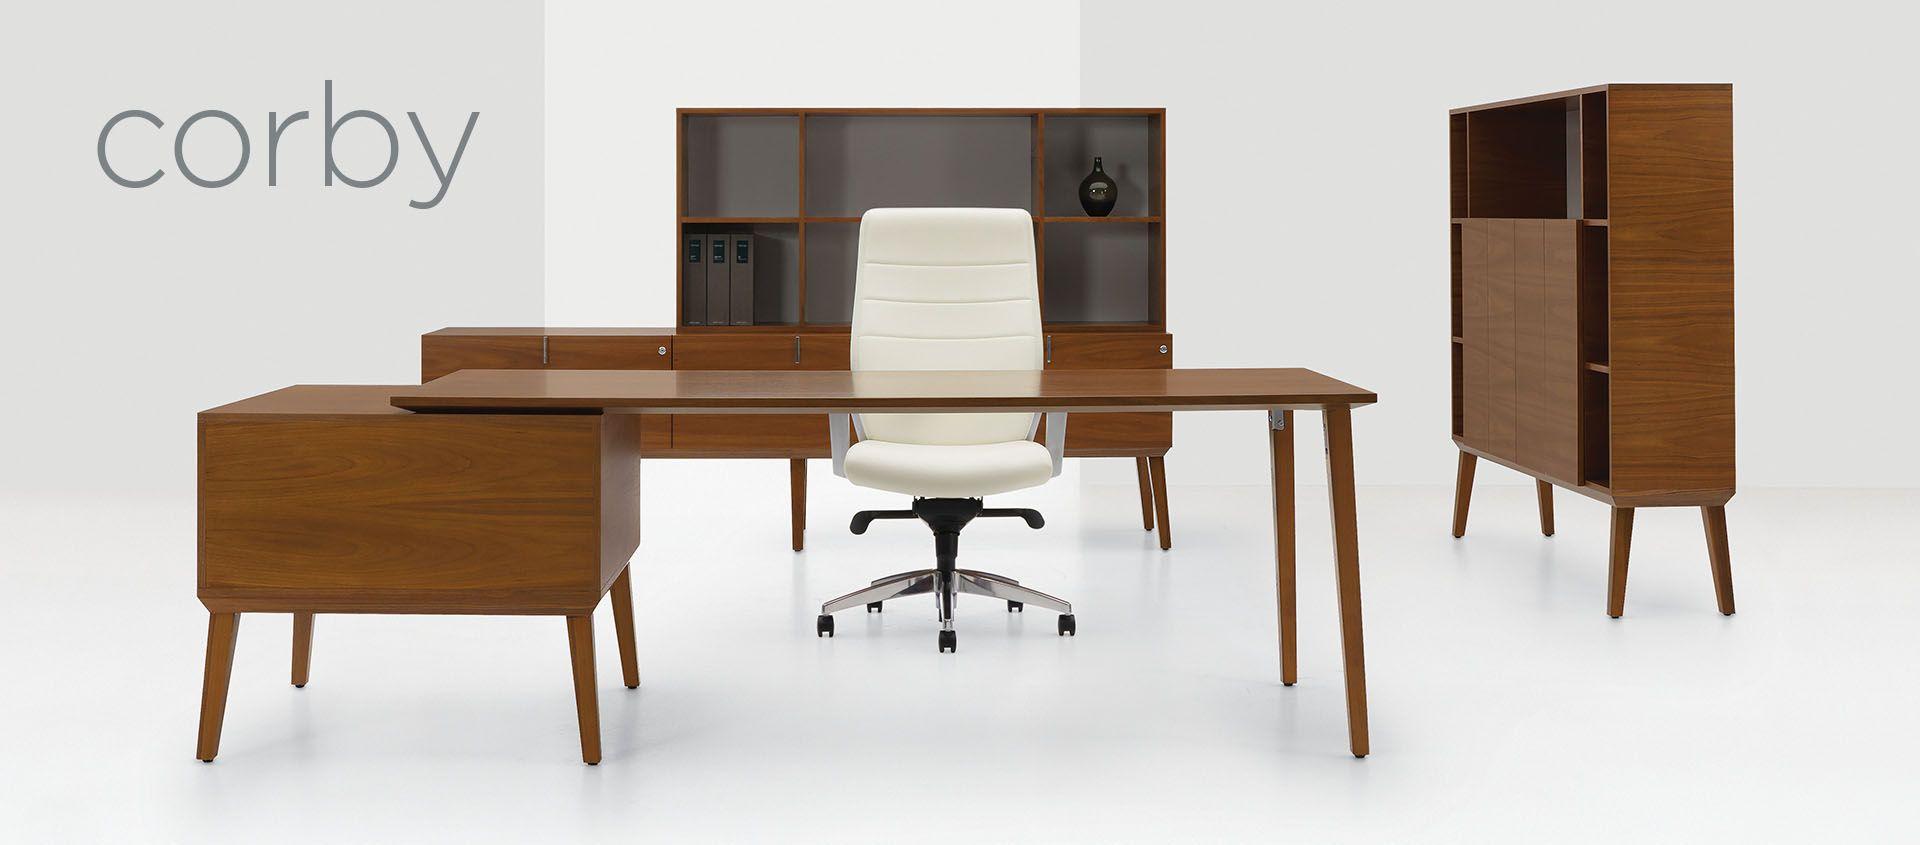 Global Corby Furniture